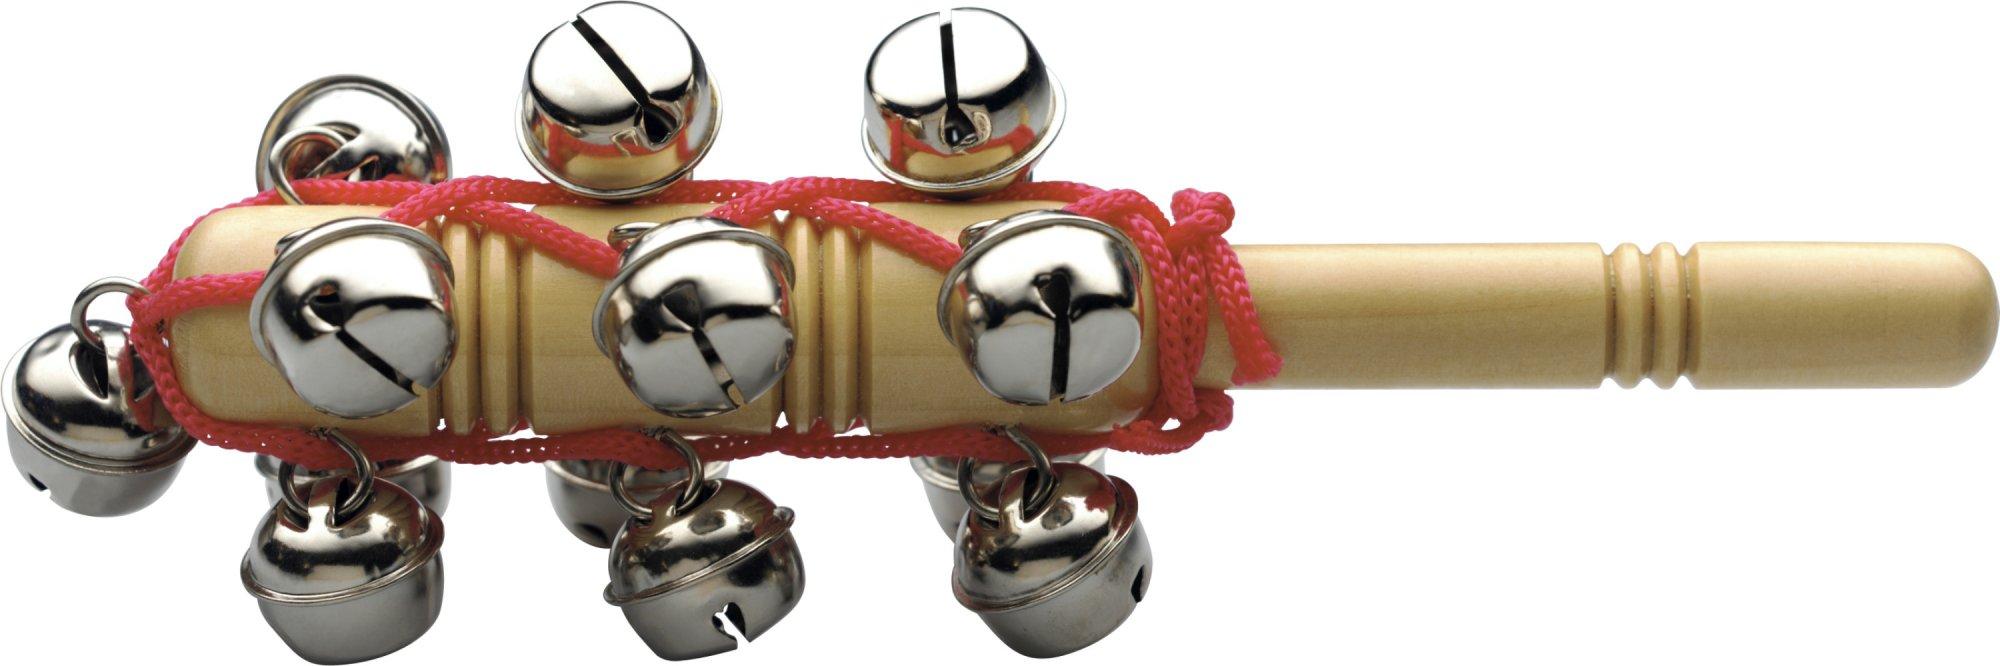 Stagg SLBM-13T Sleigh Bells - 13 Bells